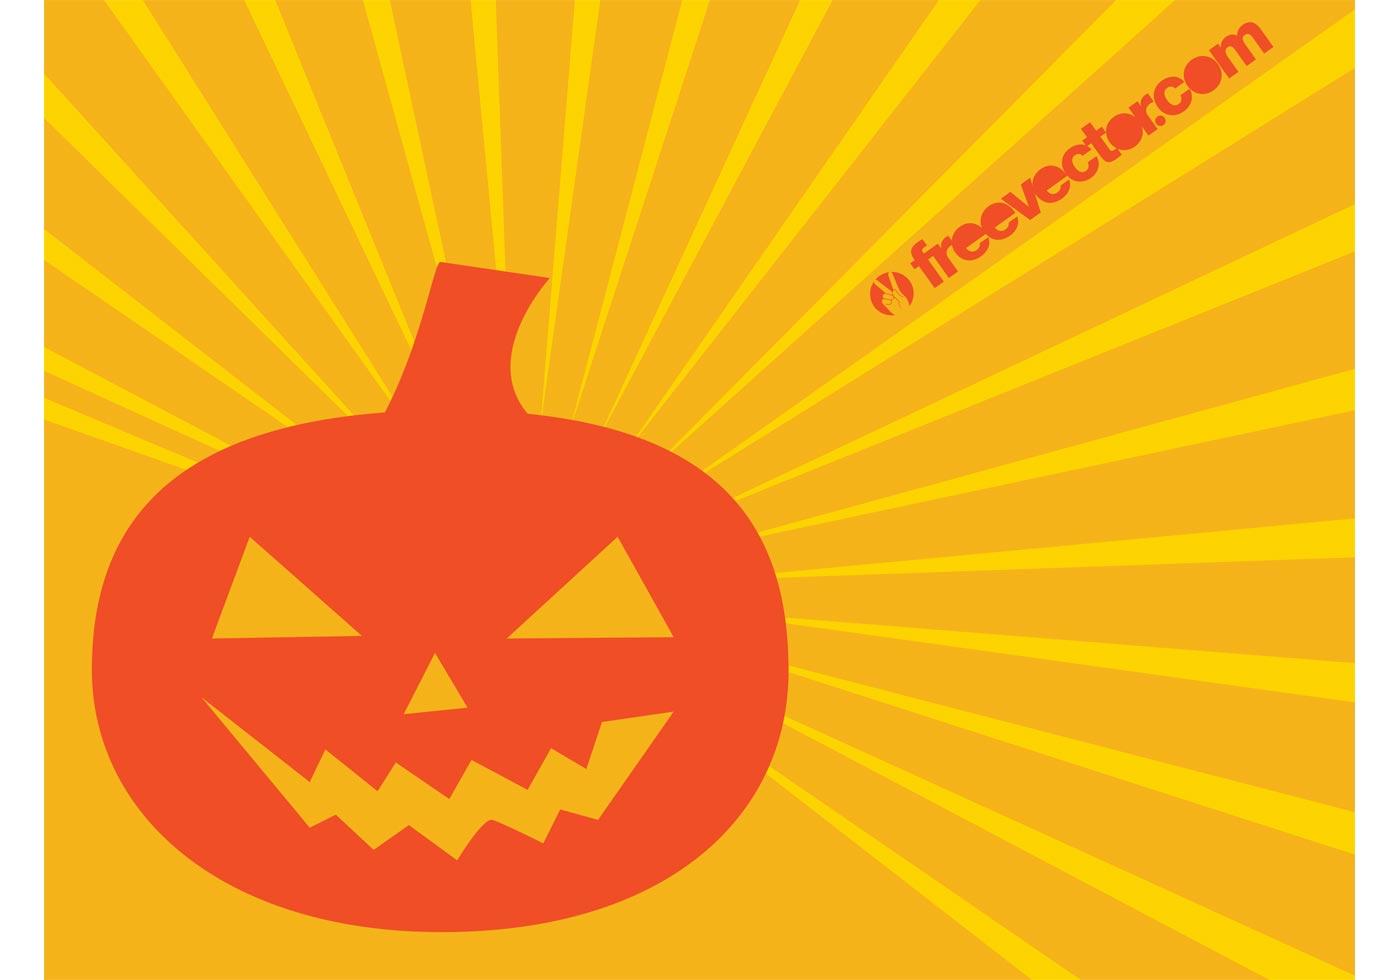 Cute Happy Faces Wallpaper Halloween Pumpkin Vector Character Download Free Vector